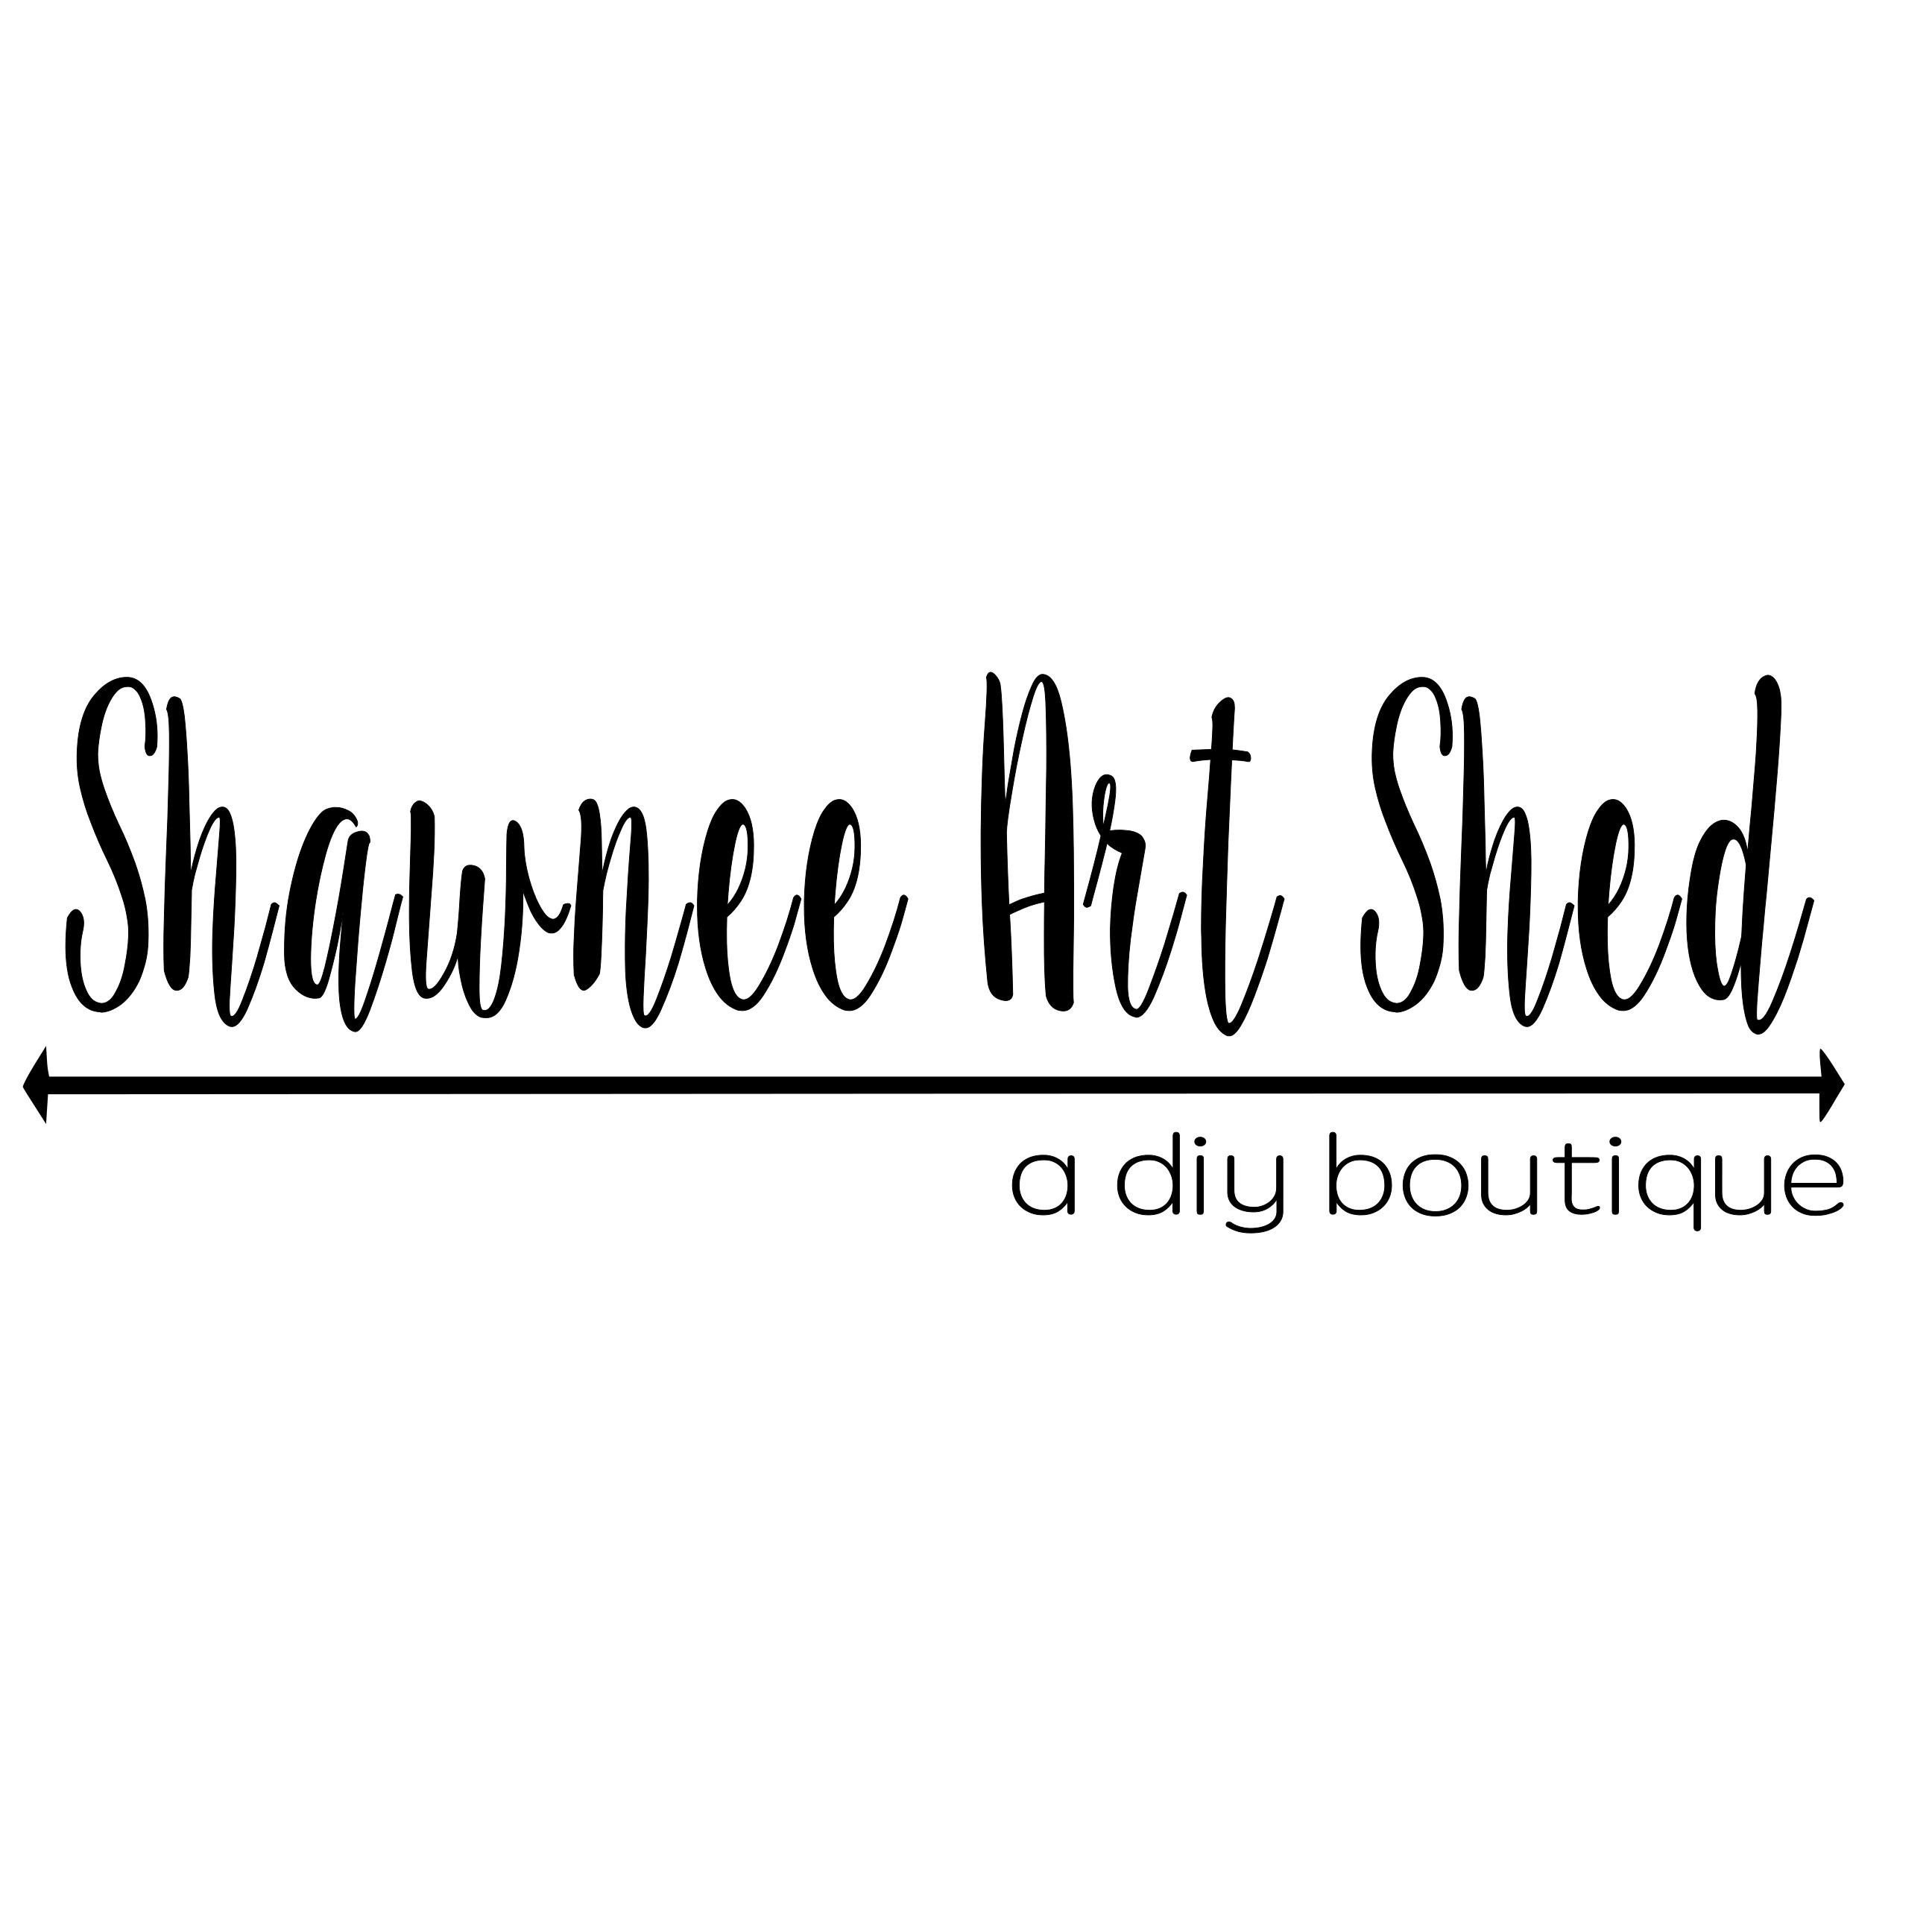 Shawnee Art Shed